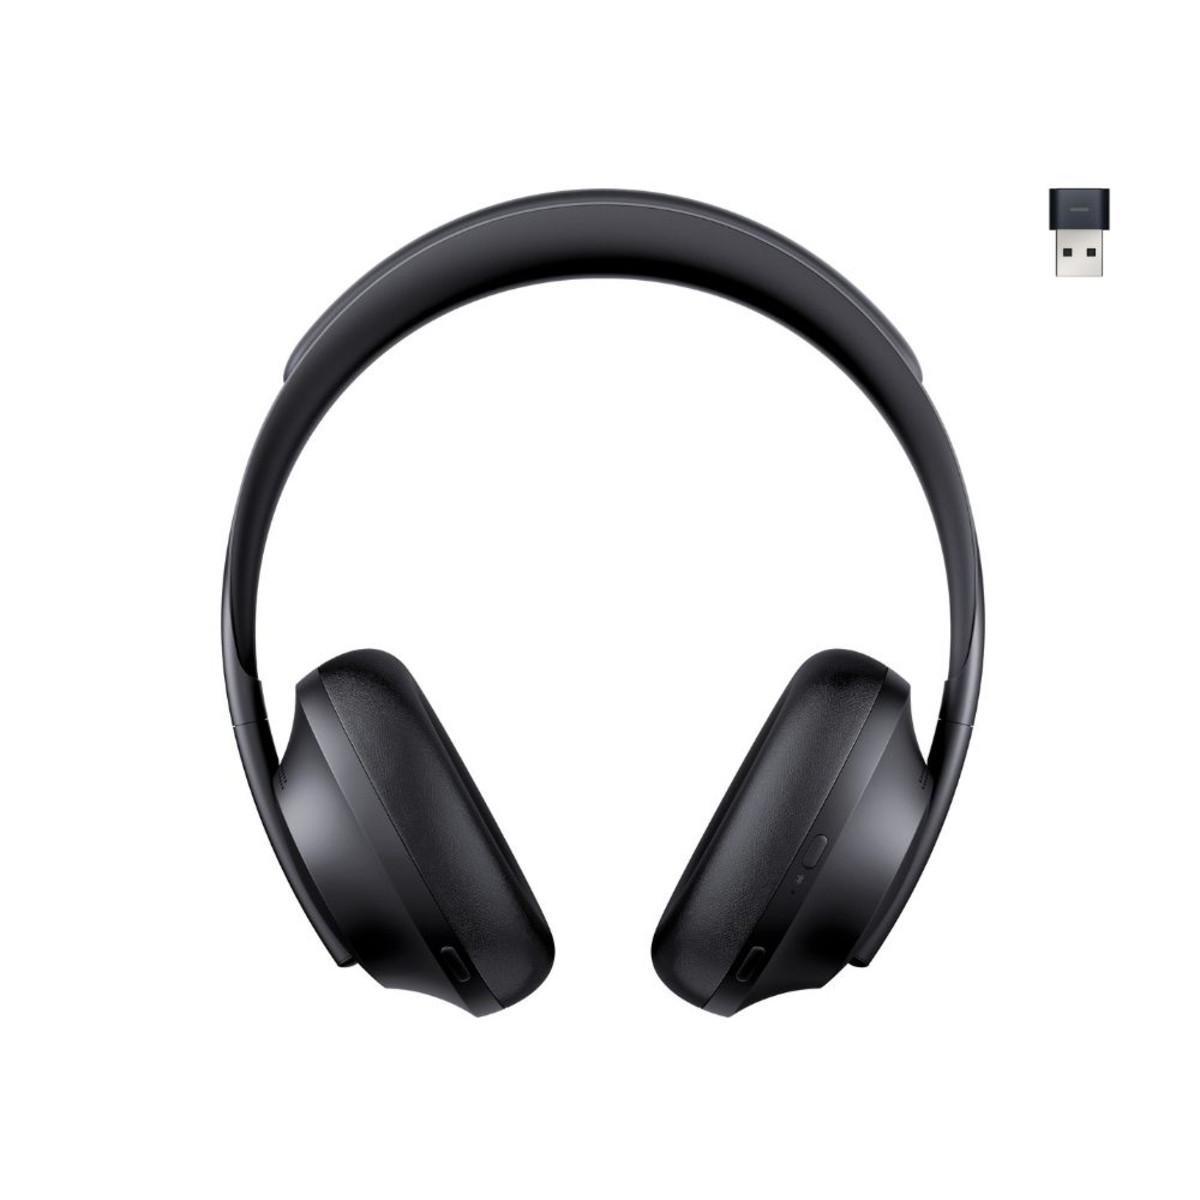 Bose 700 UC Bluetooth Headphone USB-A, Black (no return)